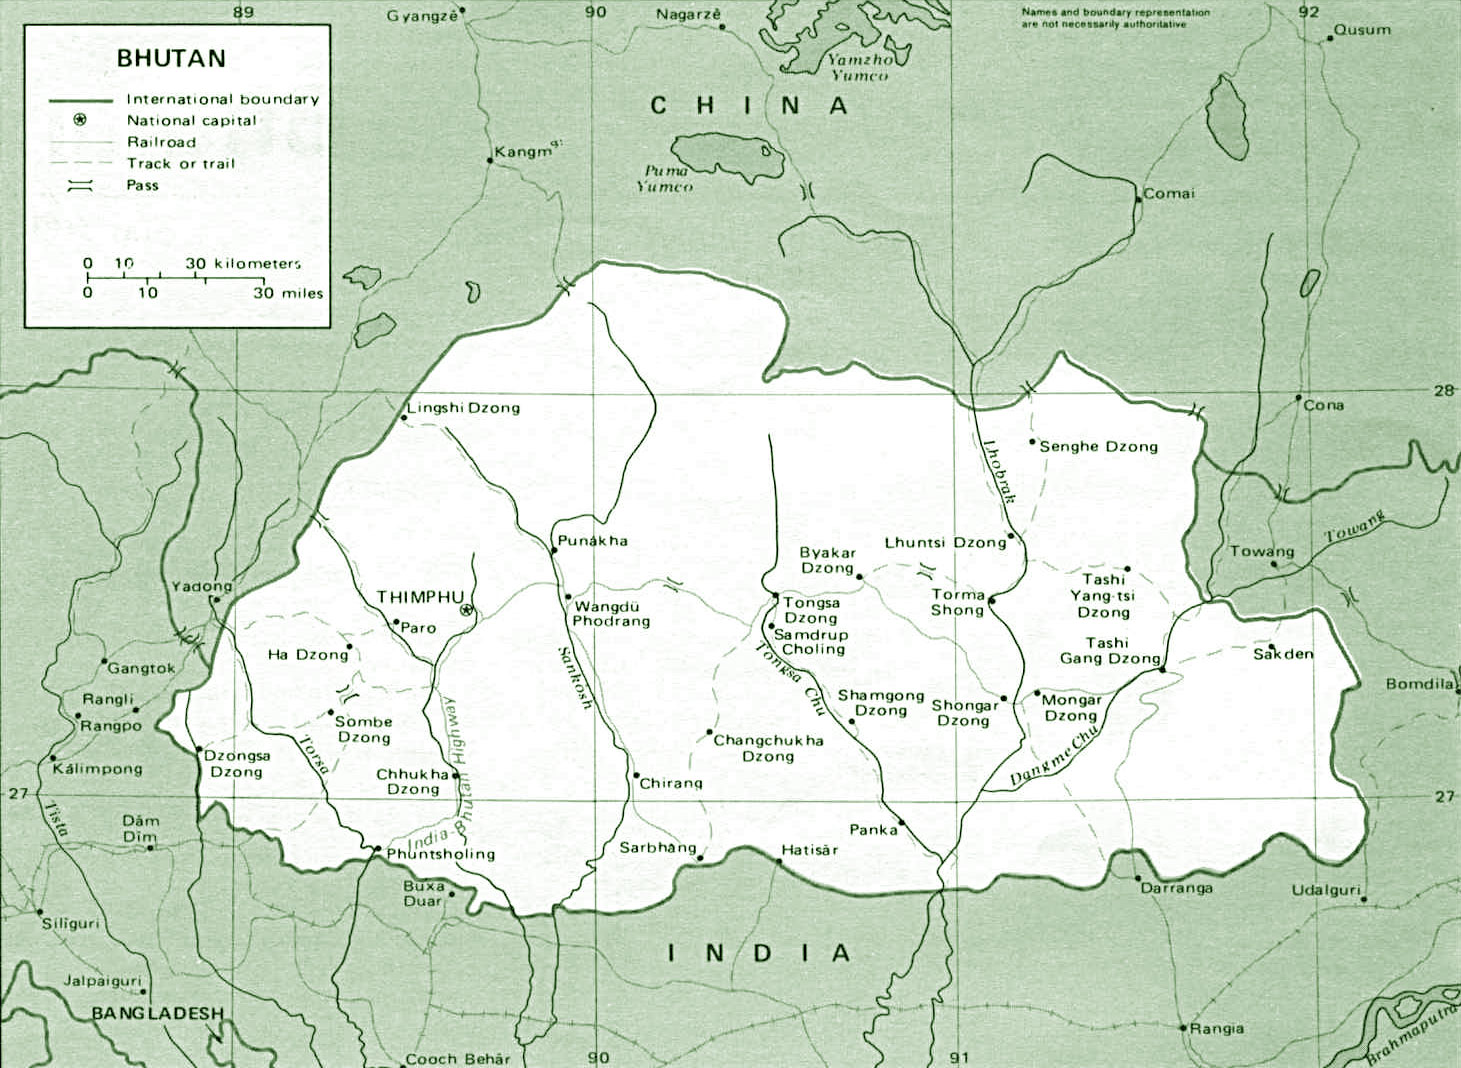 image: Bhutan Political Map